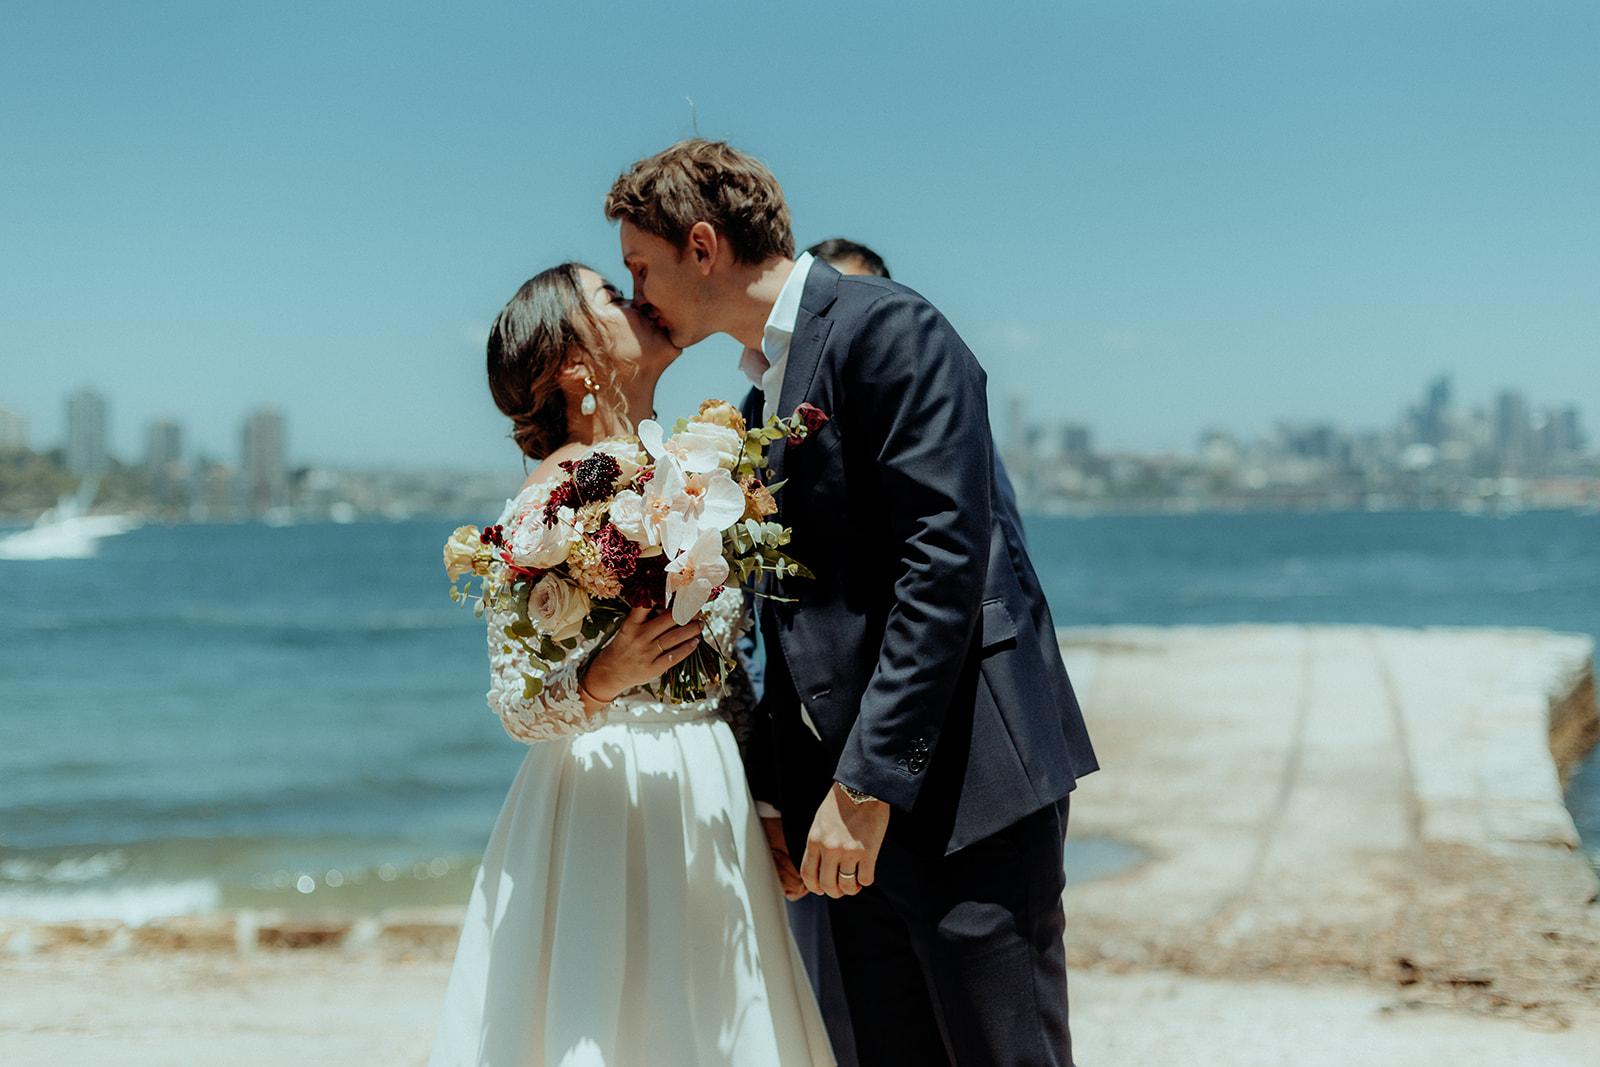 Karis and Oli_Sydney Wedding_Bradleys Head_Holly Medway Photography-522.jpg